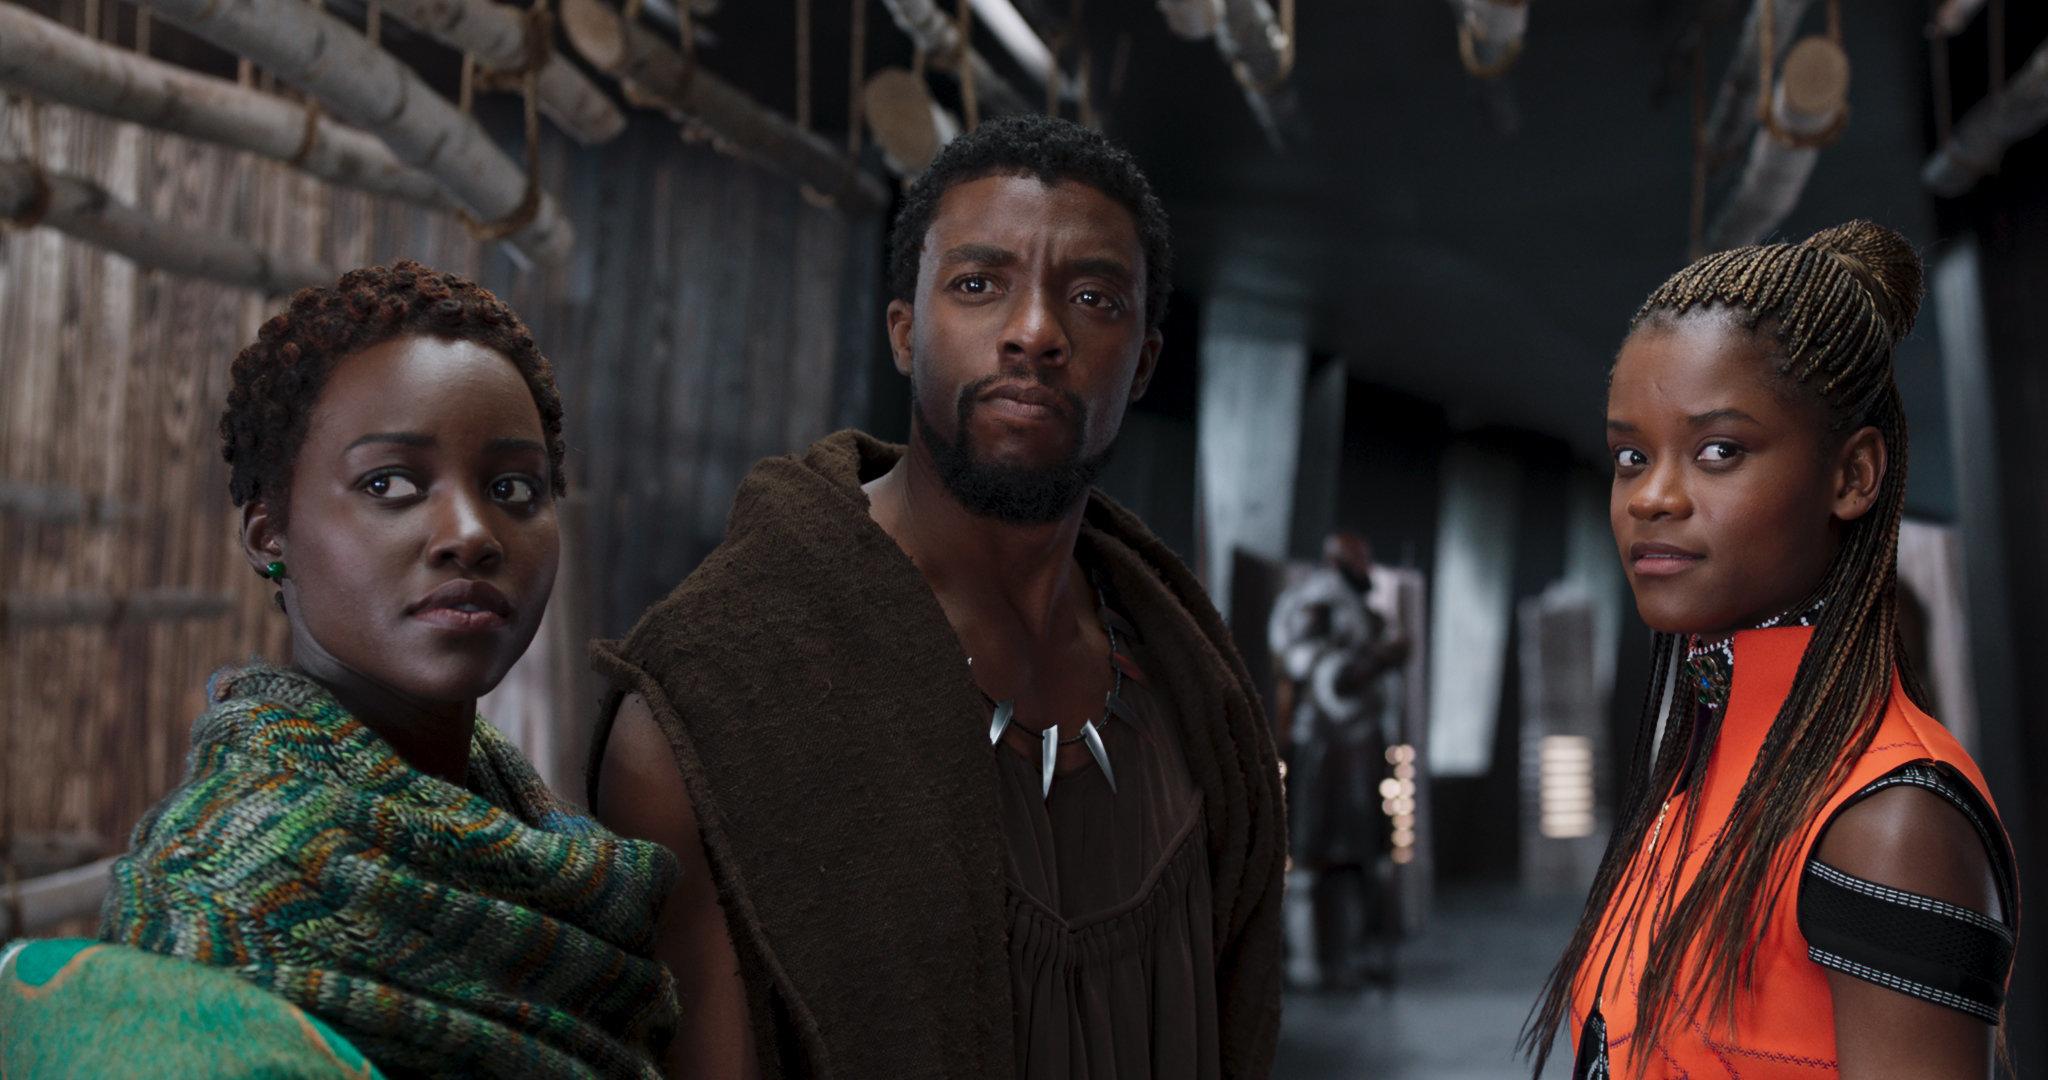 Lupita Nyong'o, Chadwick Boseman and Letitia Wright in